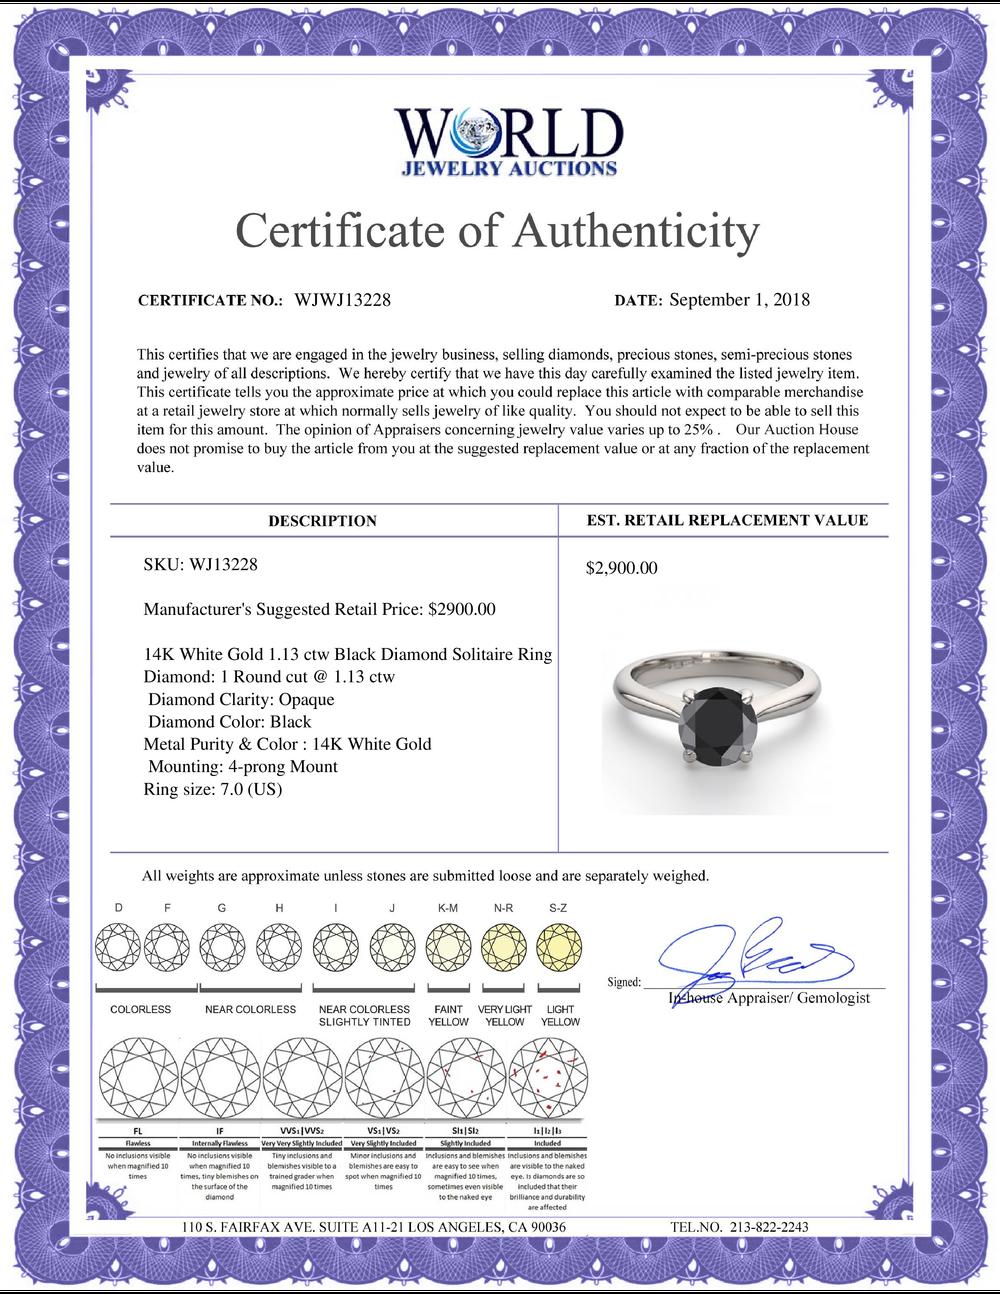 Lot 4154: 14K White Gold 1.13 ctw Black Diamond Solitaire Ring - REF-73Y6X-WJ13228